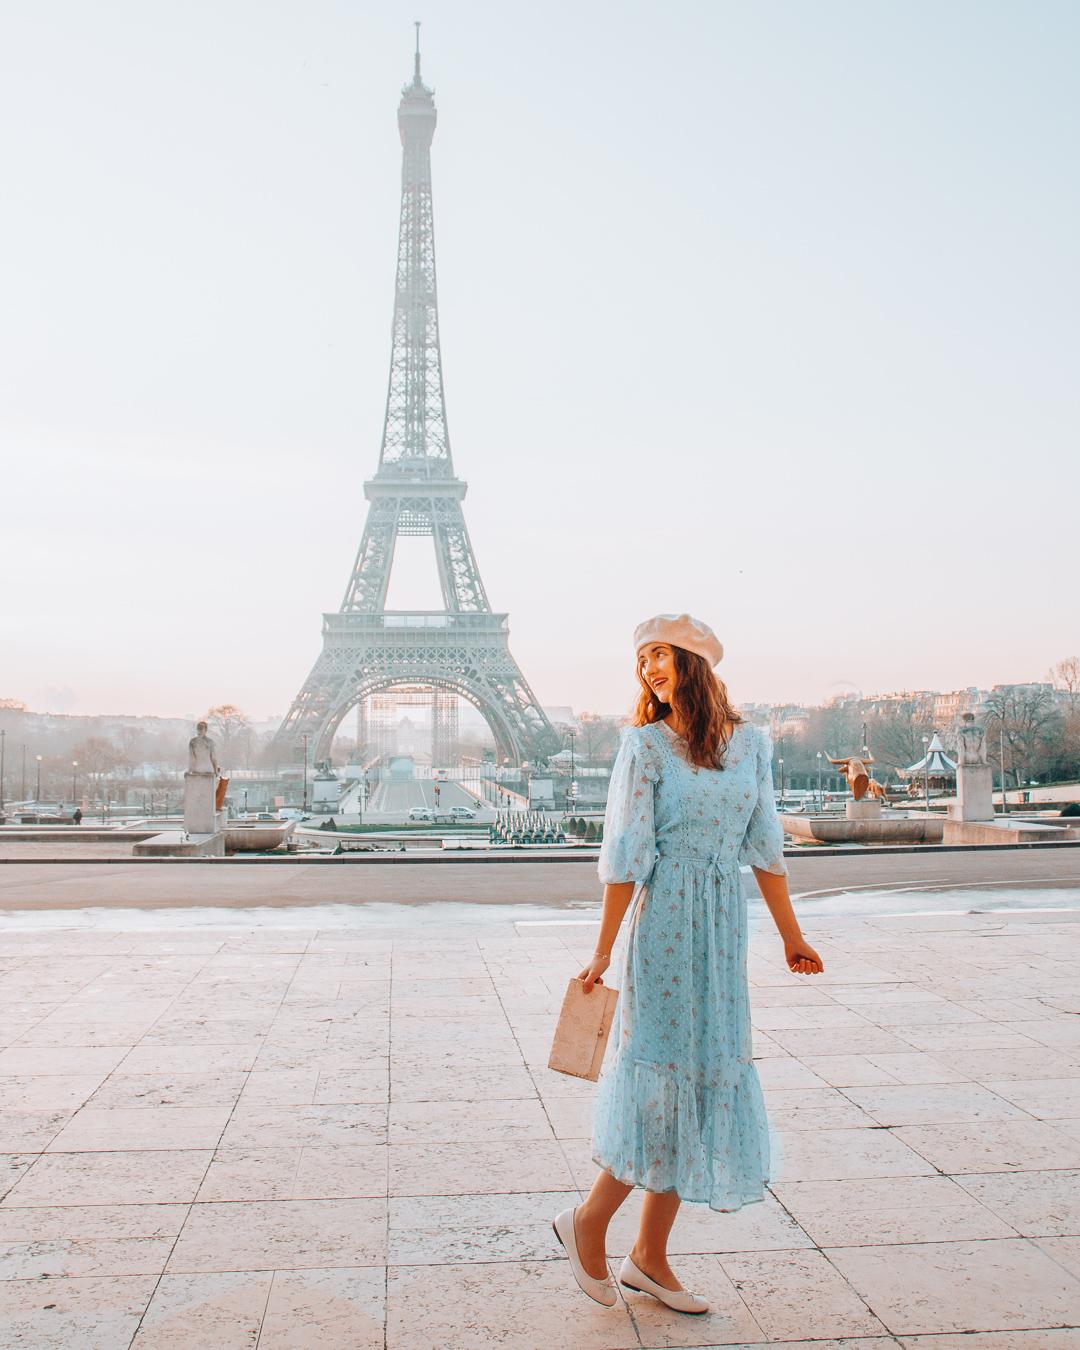 Lower level of Trocadéro